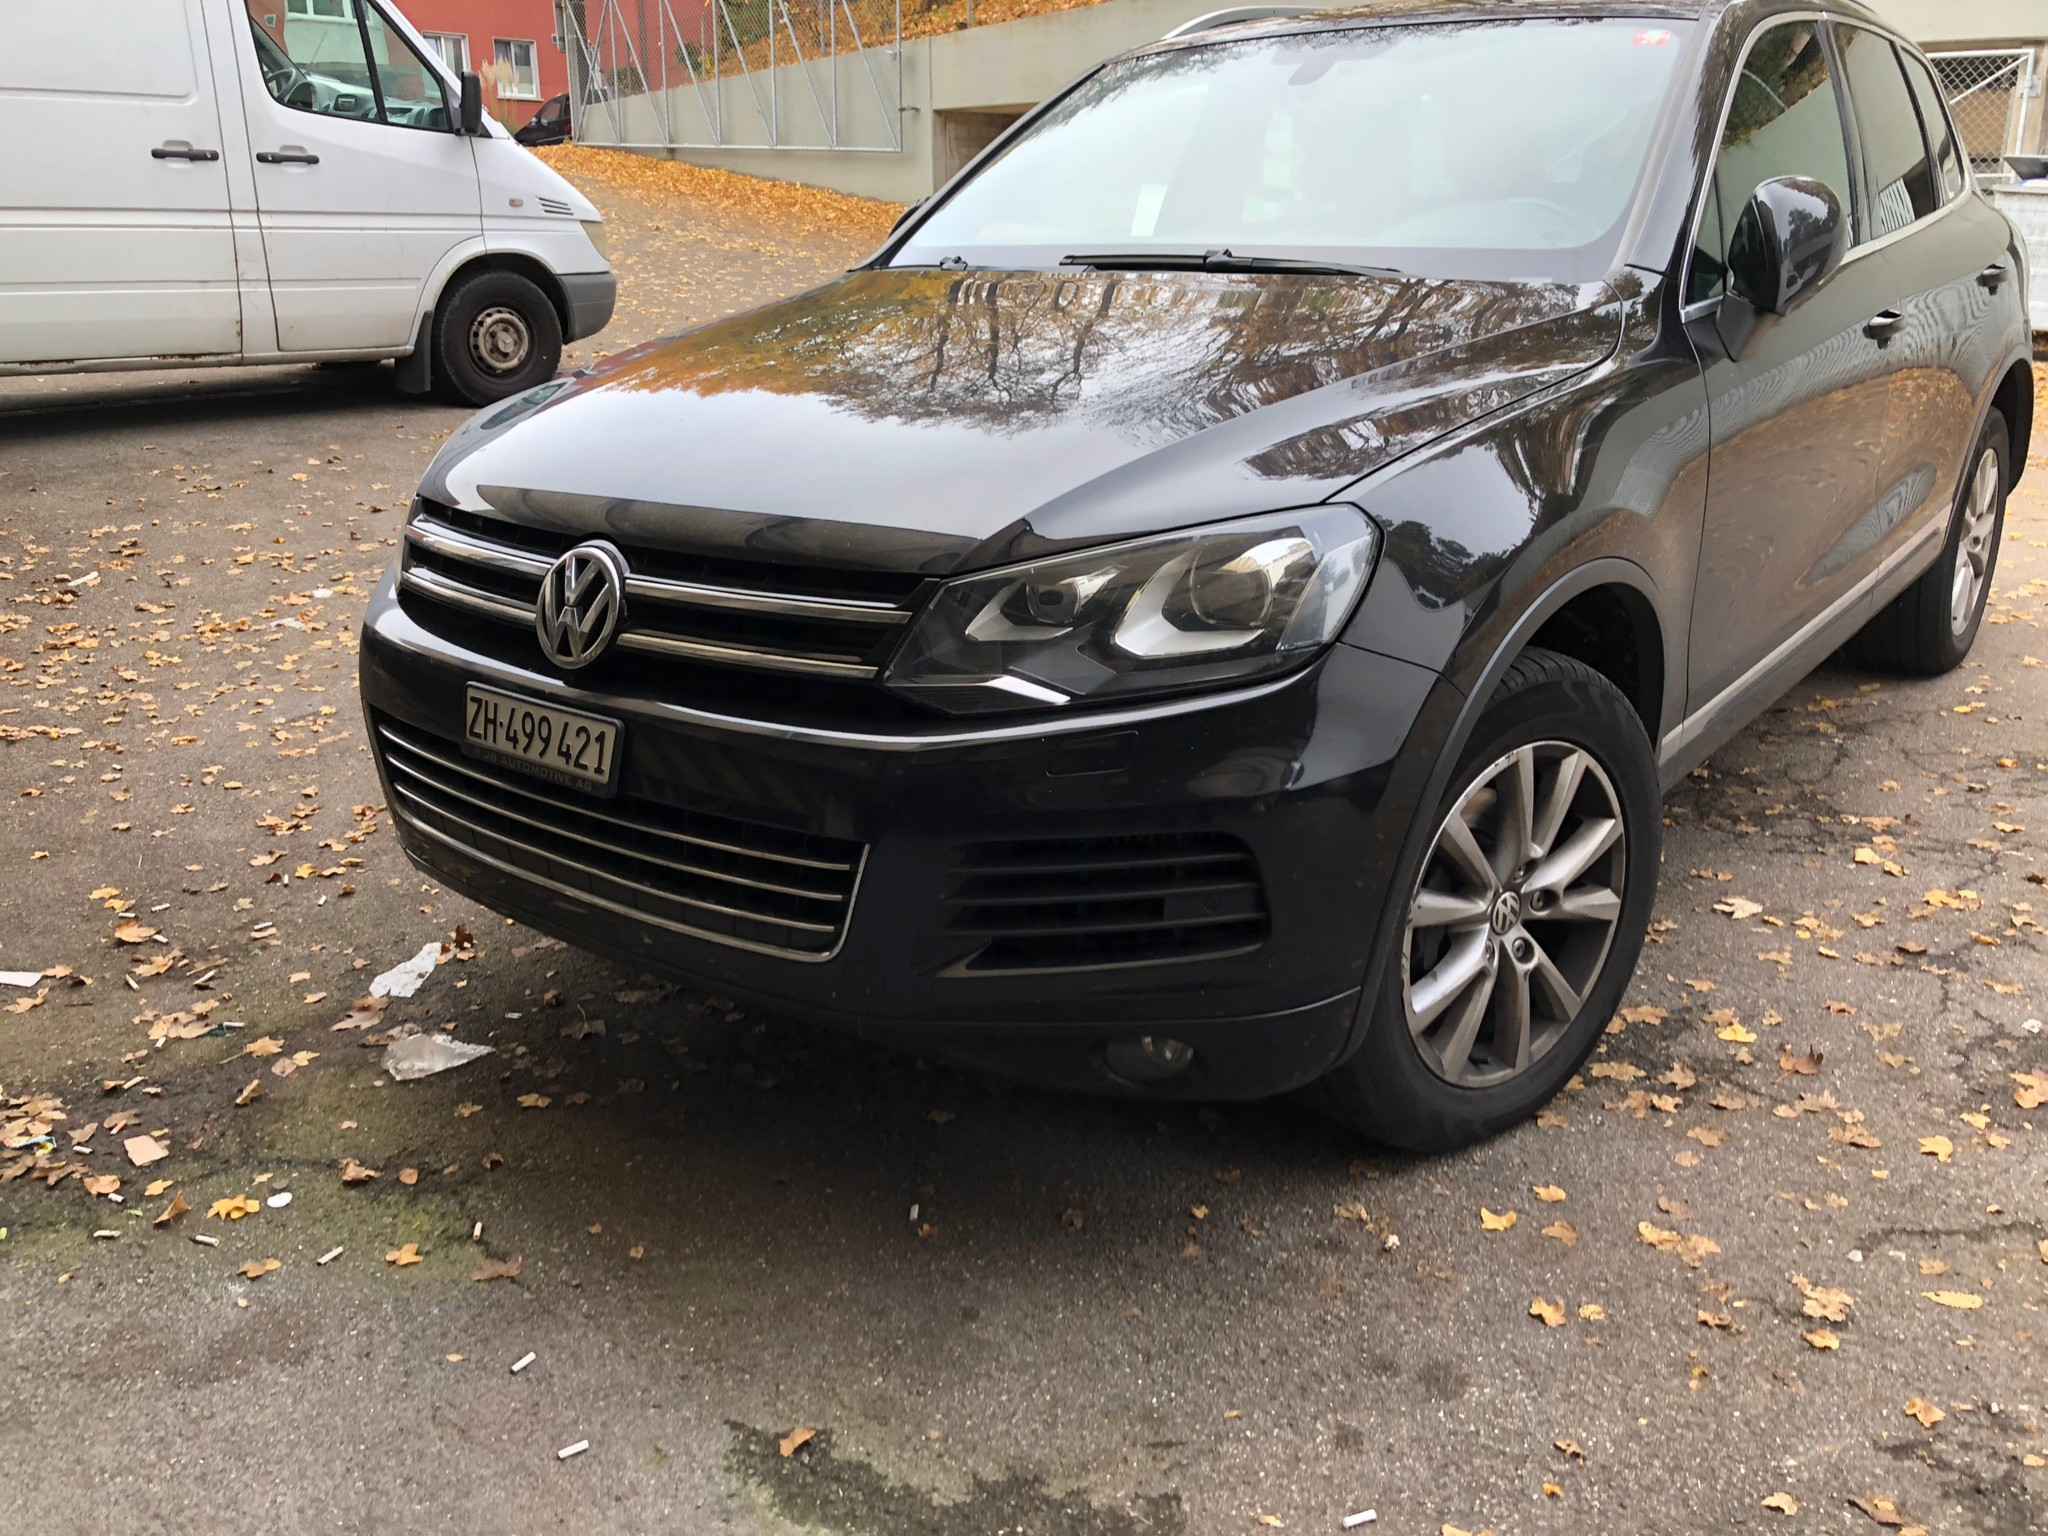 suv VW Touareg Tuareg 3.0 Disel frich MFK